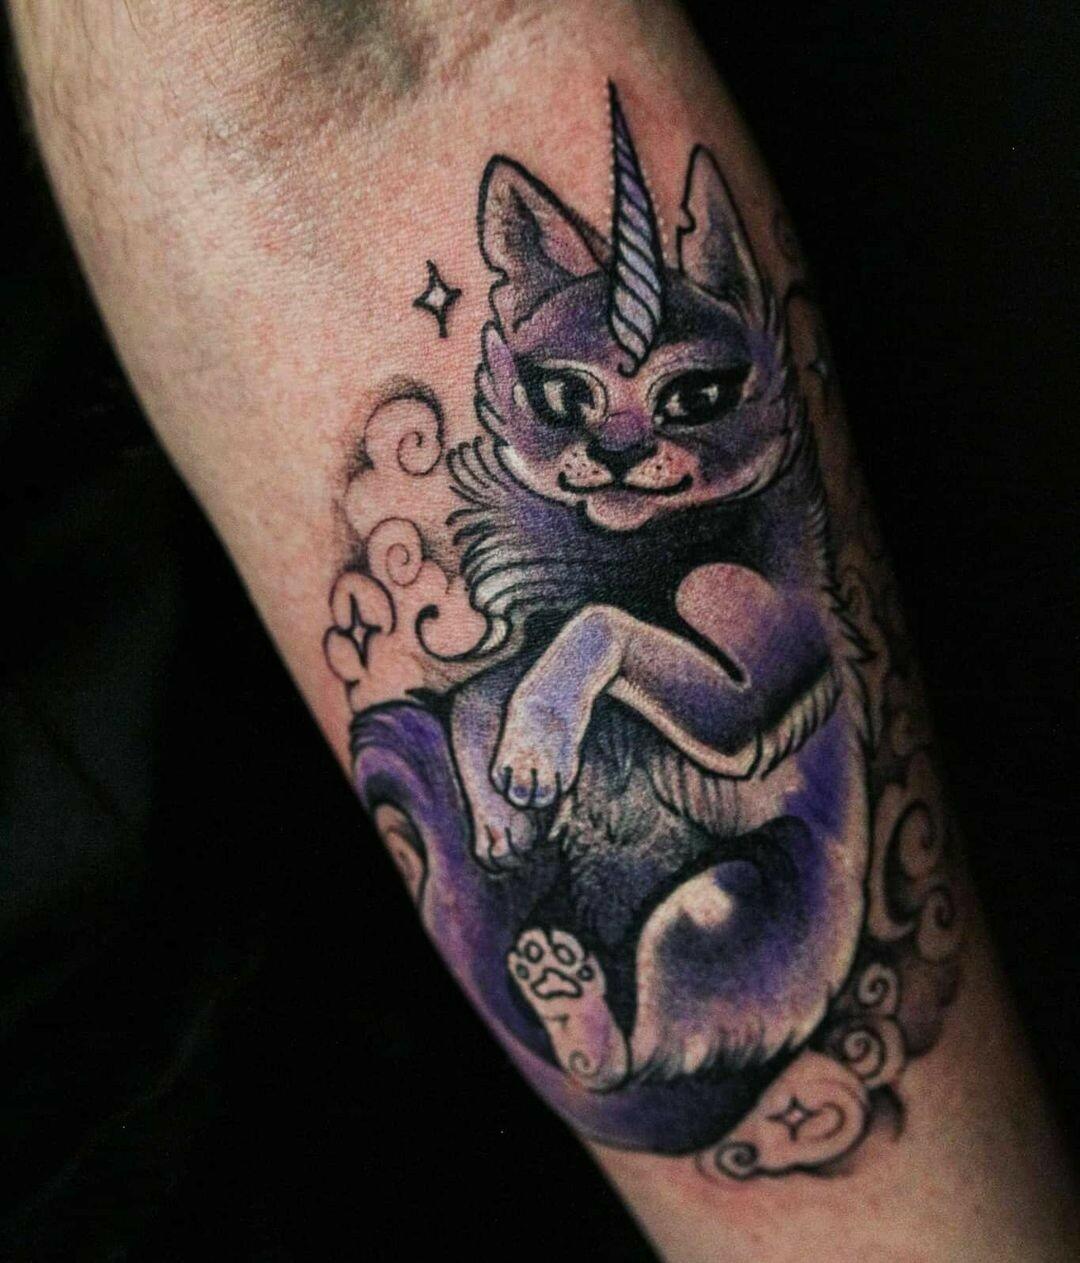 Inksearch tattoo Asia Azja Legoda